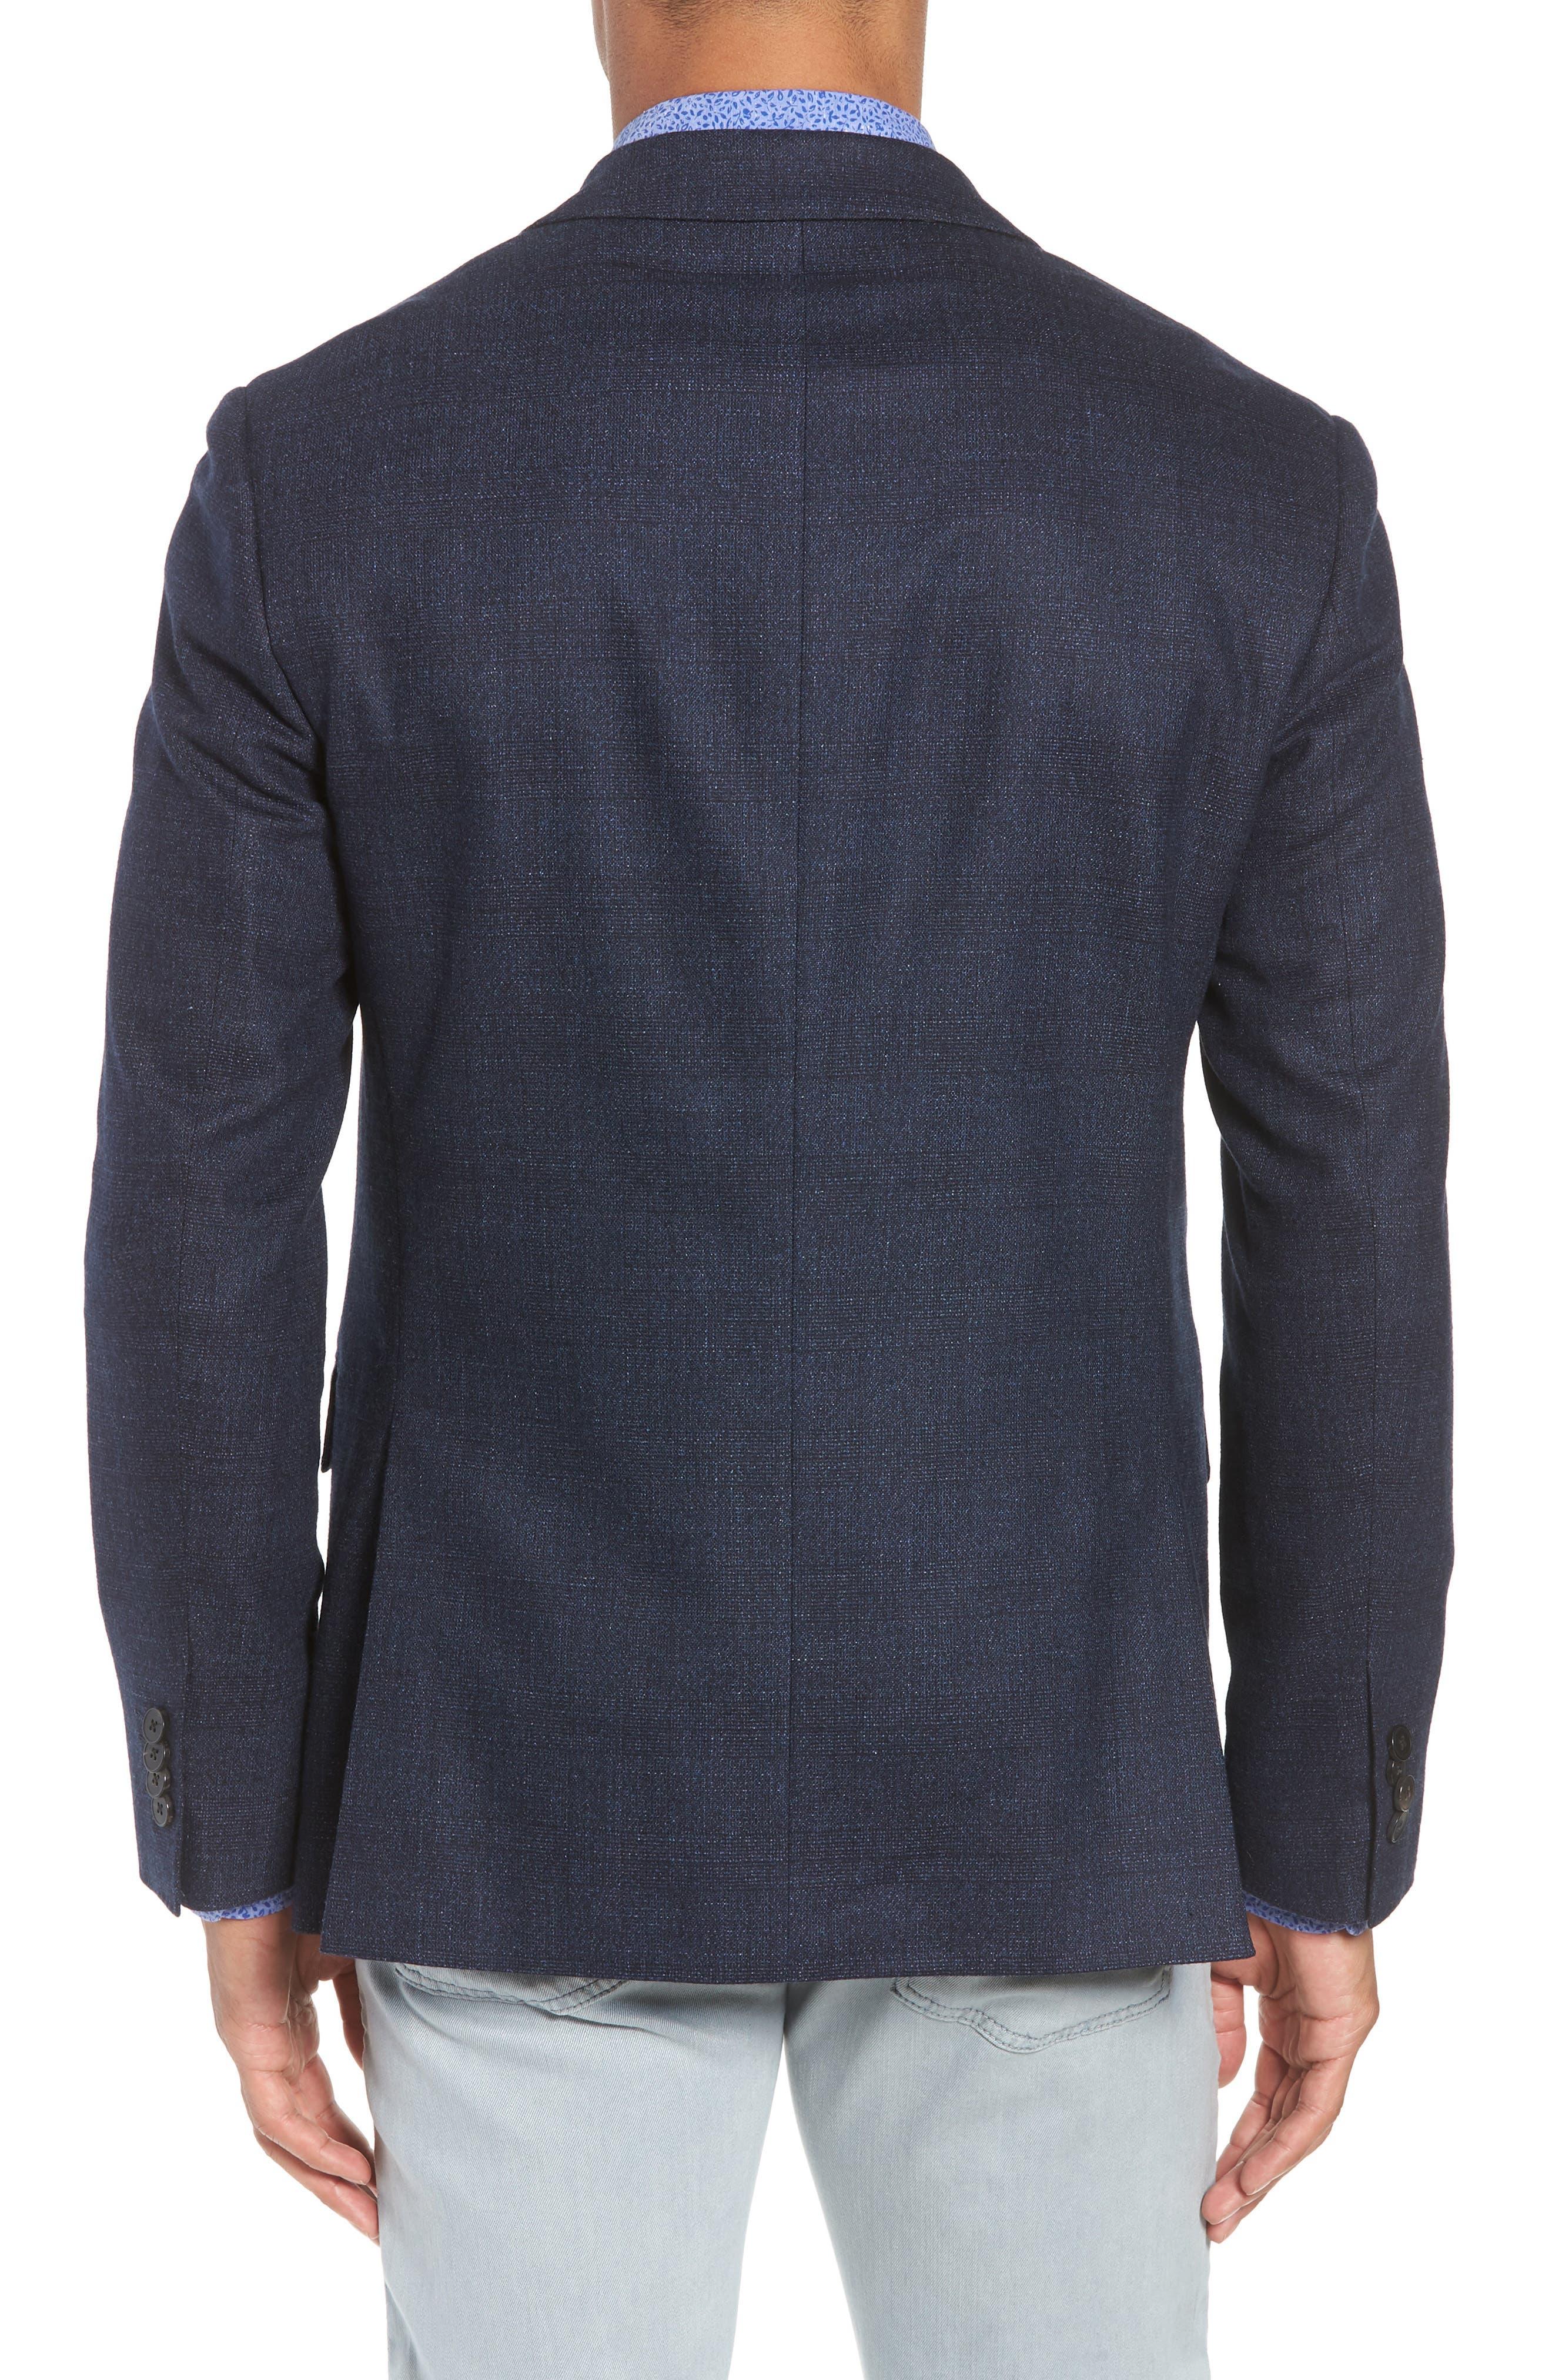 Dannevirk Ghost Check Stretch Wool Blend Blazer,                             Alternate thumbnail 2, color,                             NAVY